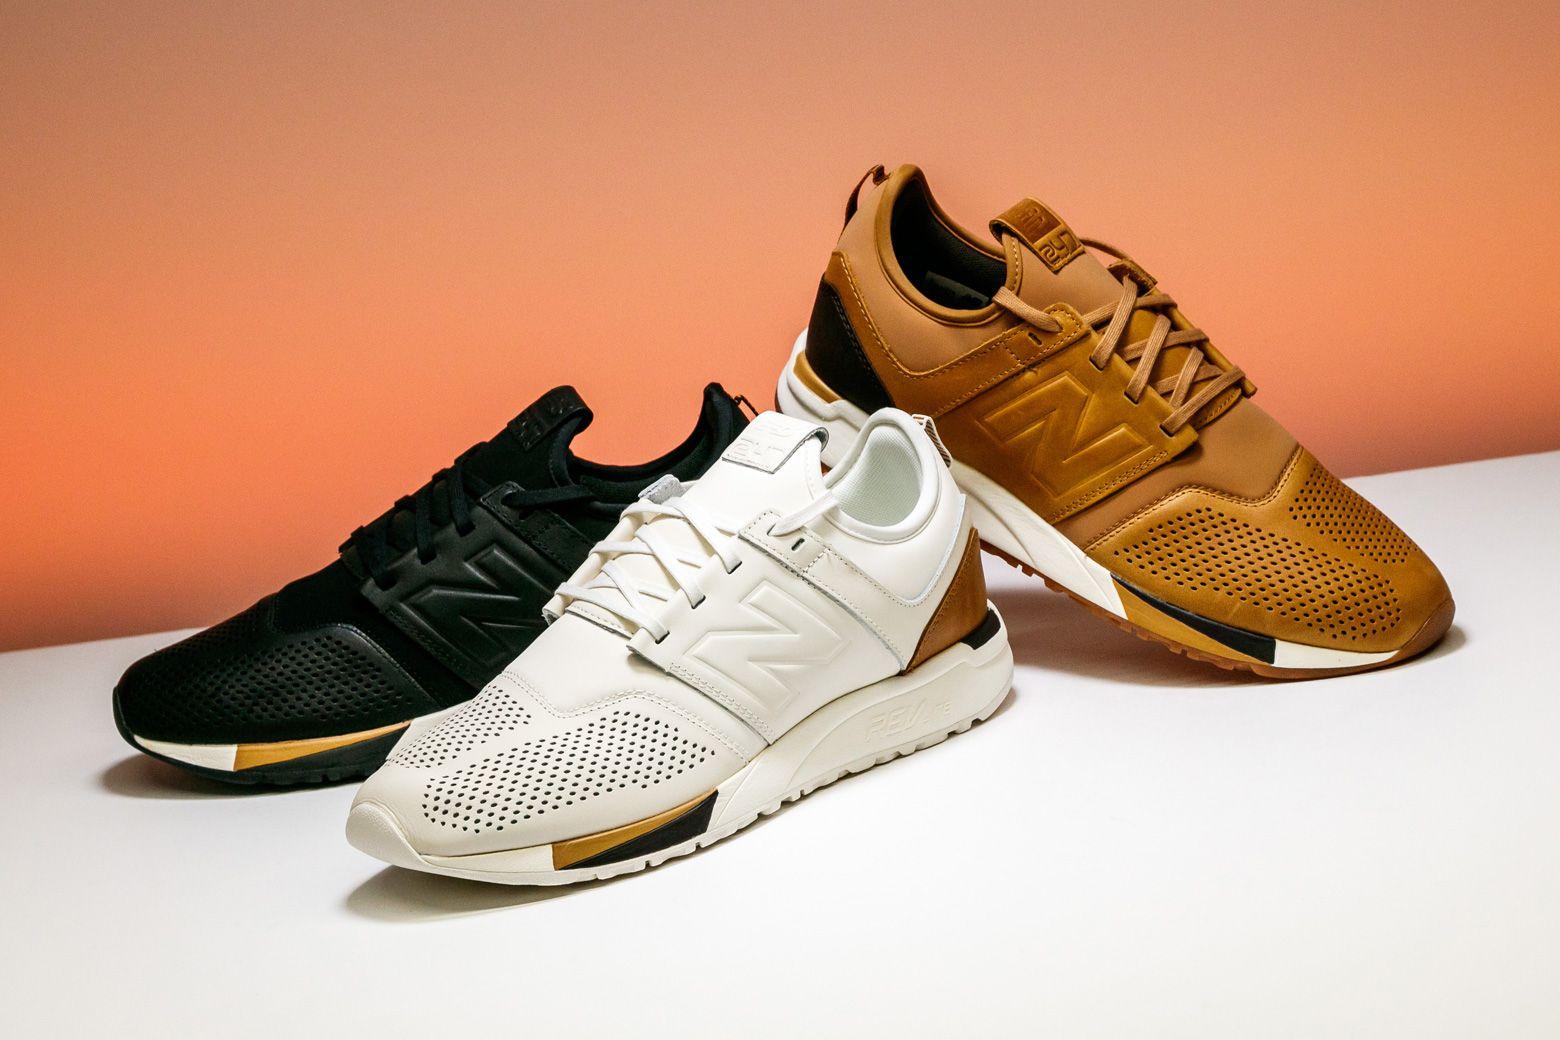 New balance, Air max sneakers, Sneakers